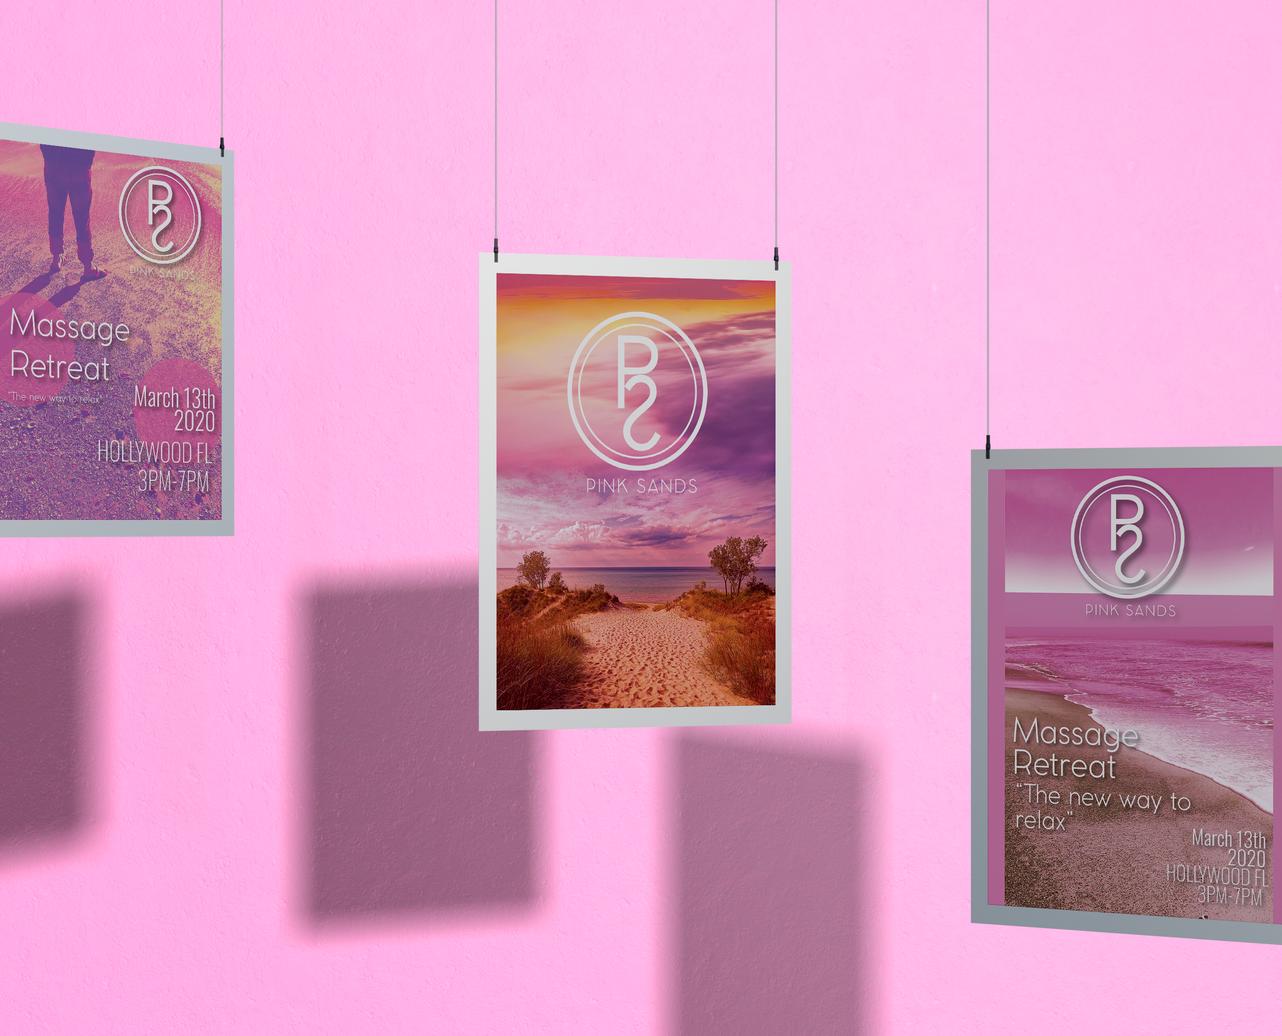 pink sands ads.png